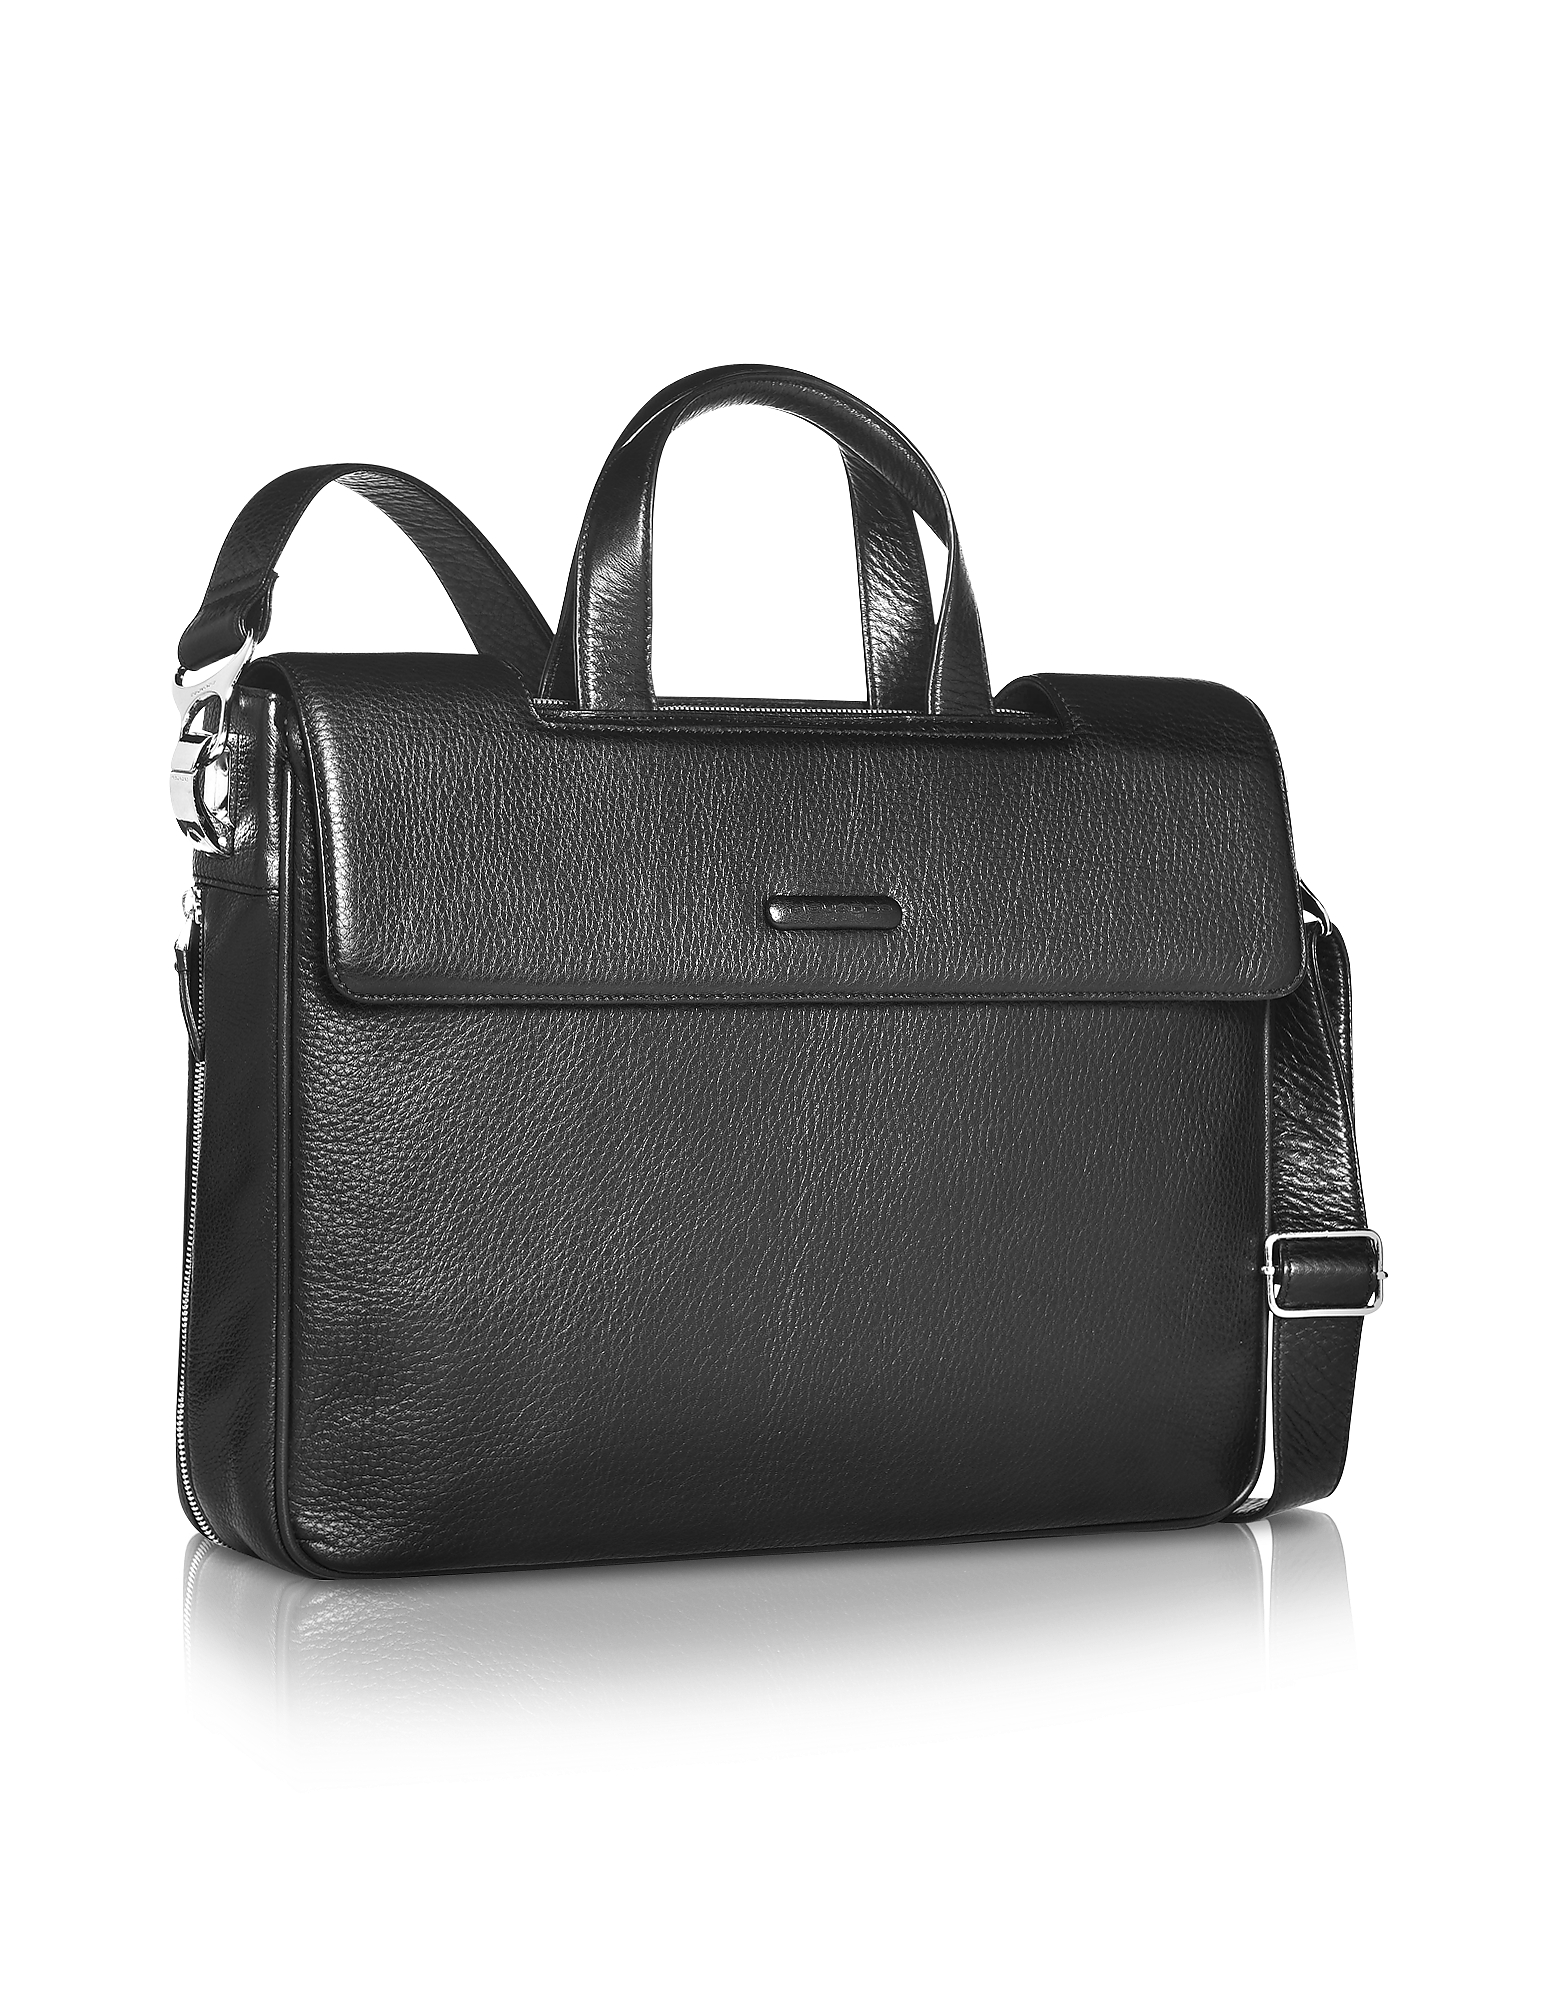 Piquadro Designer Briefcases, Modus - Expandable Black Calfskin Two-Handle Briefcase